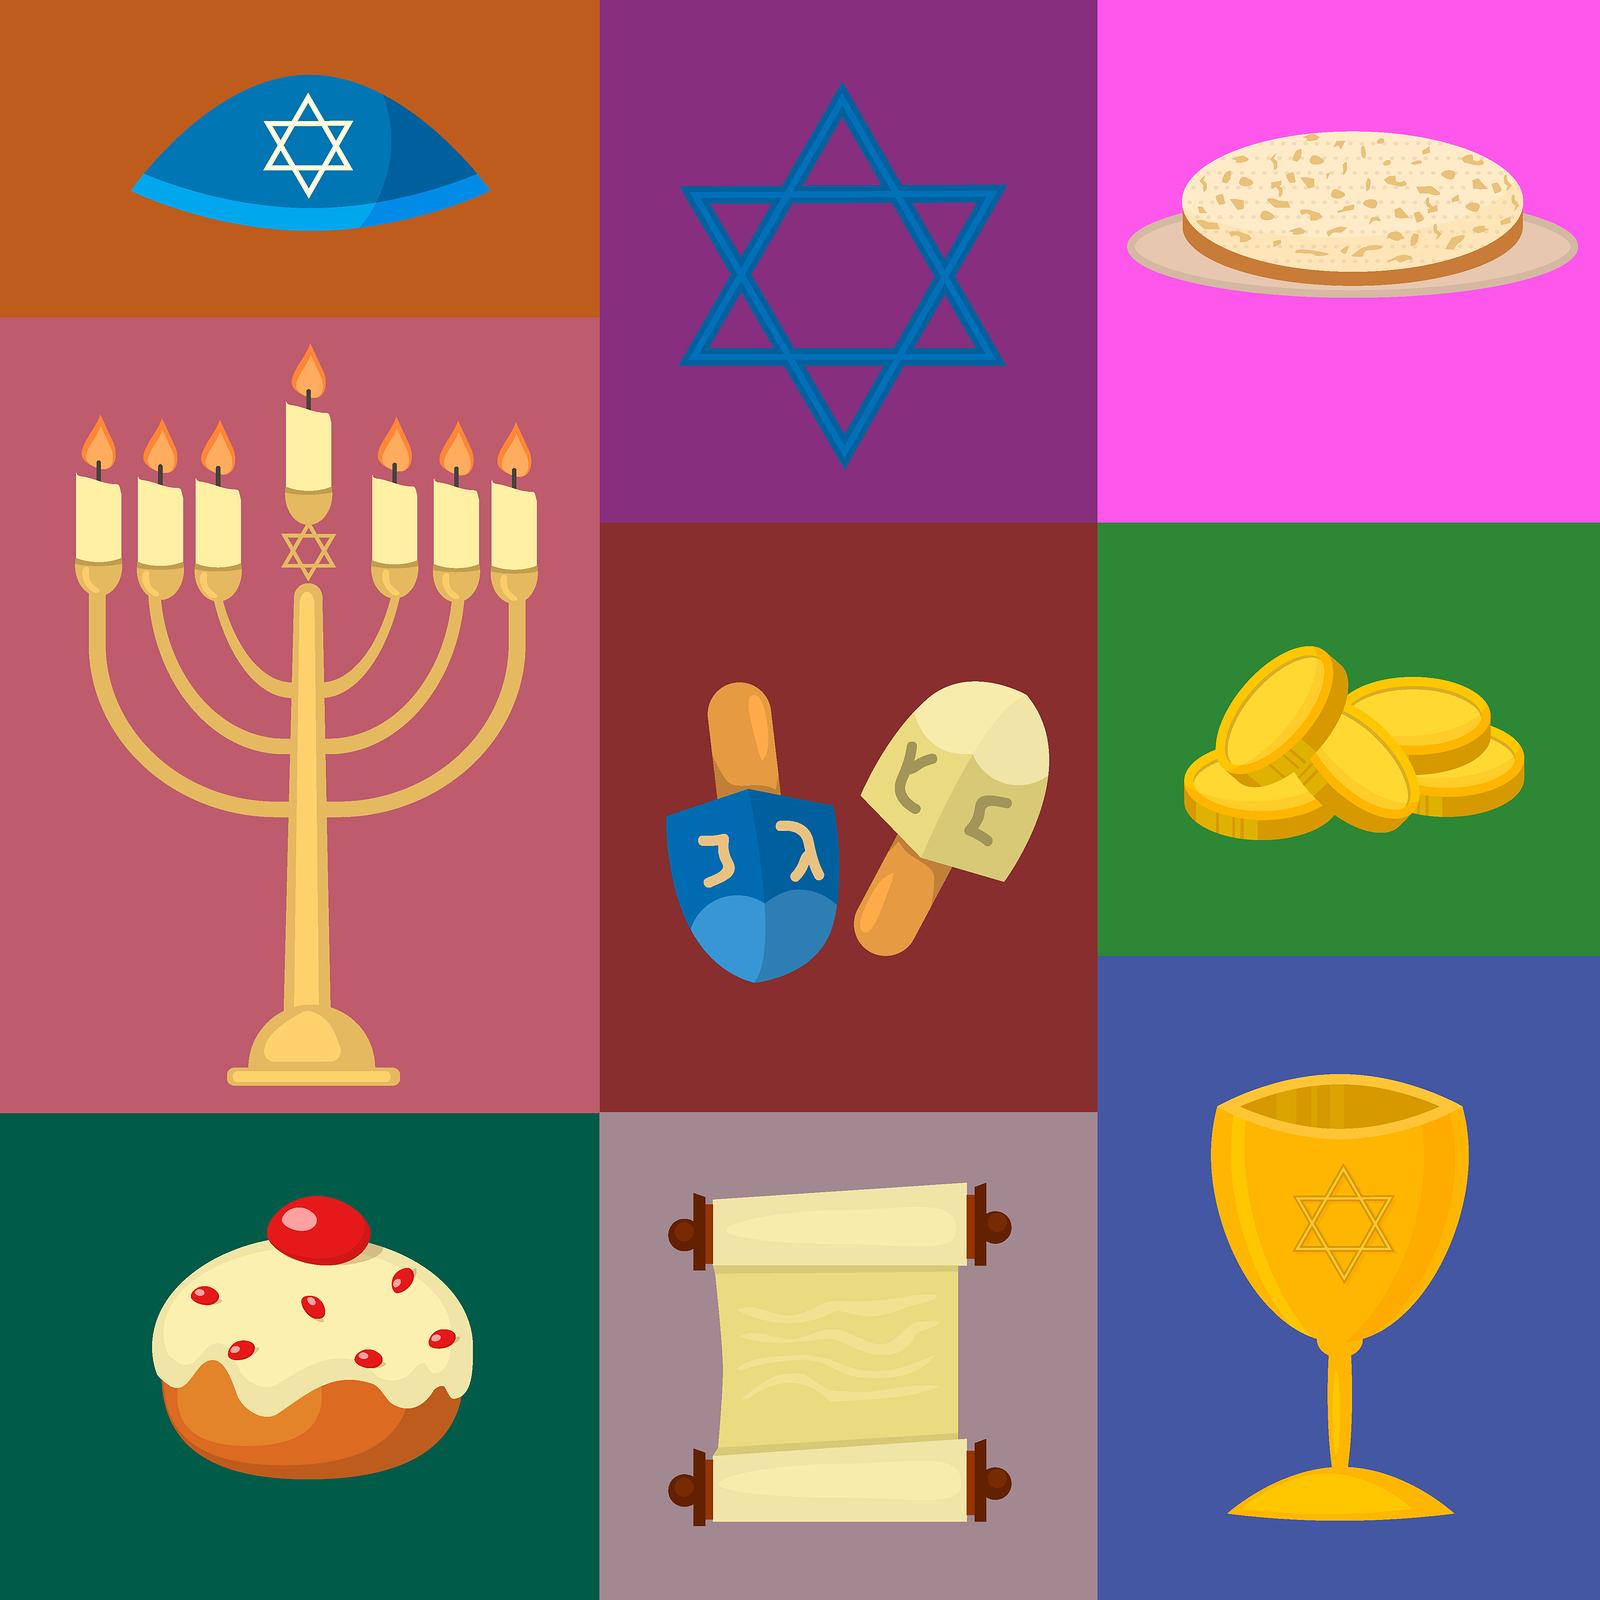 Judaism for KS1 and KS2 children.